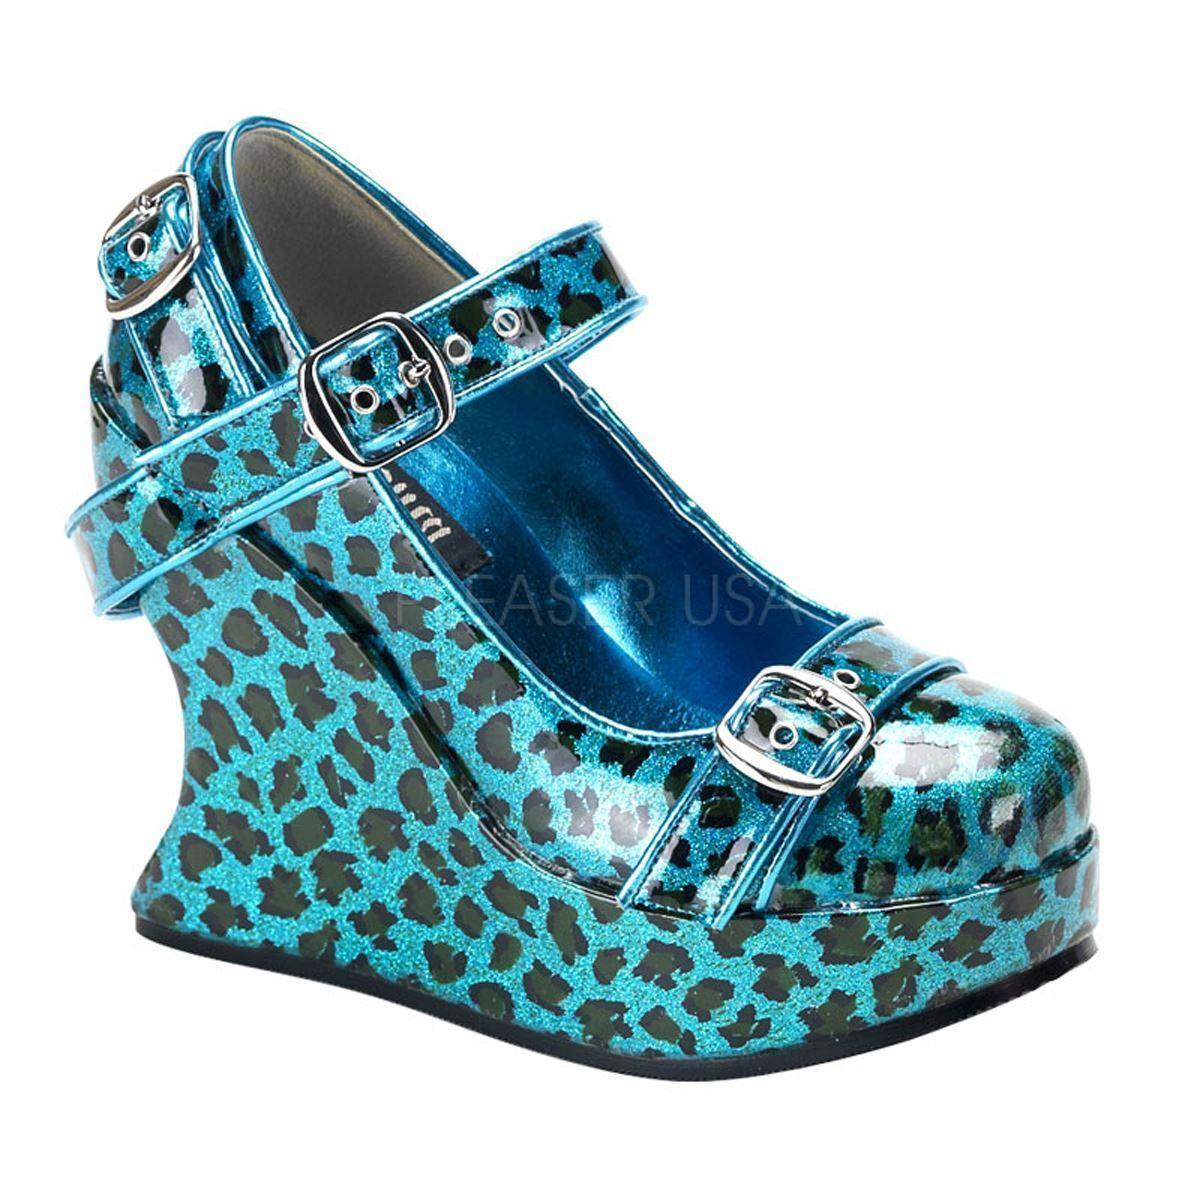 Demonia Platform Goth Lolita Punk Mary Jane Wedge Turquoise/Cheetah